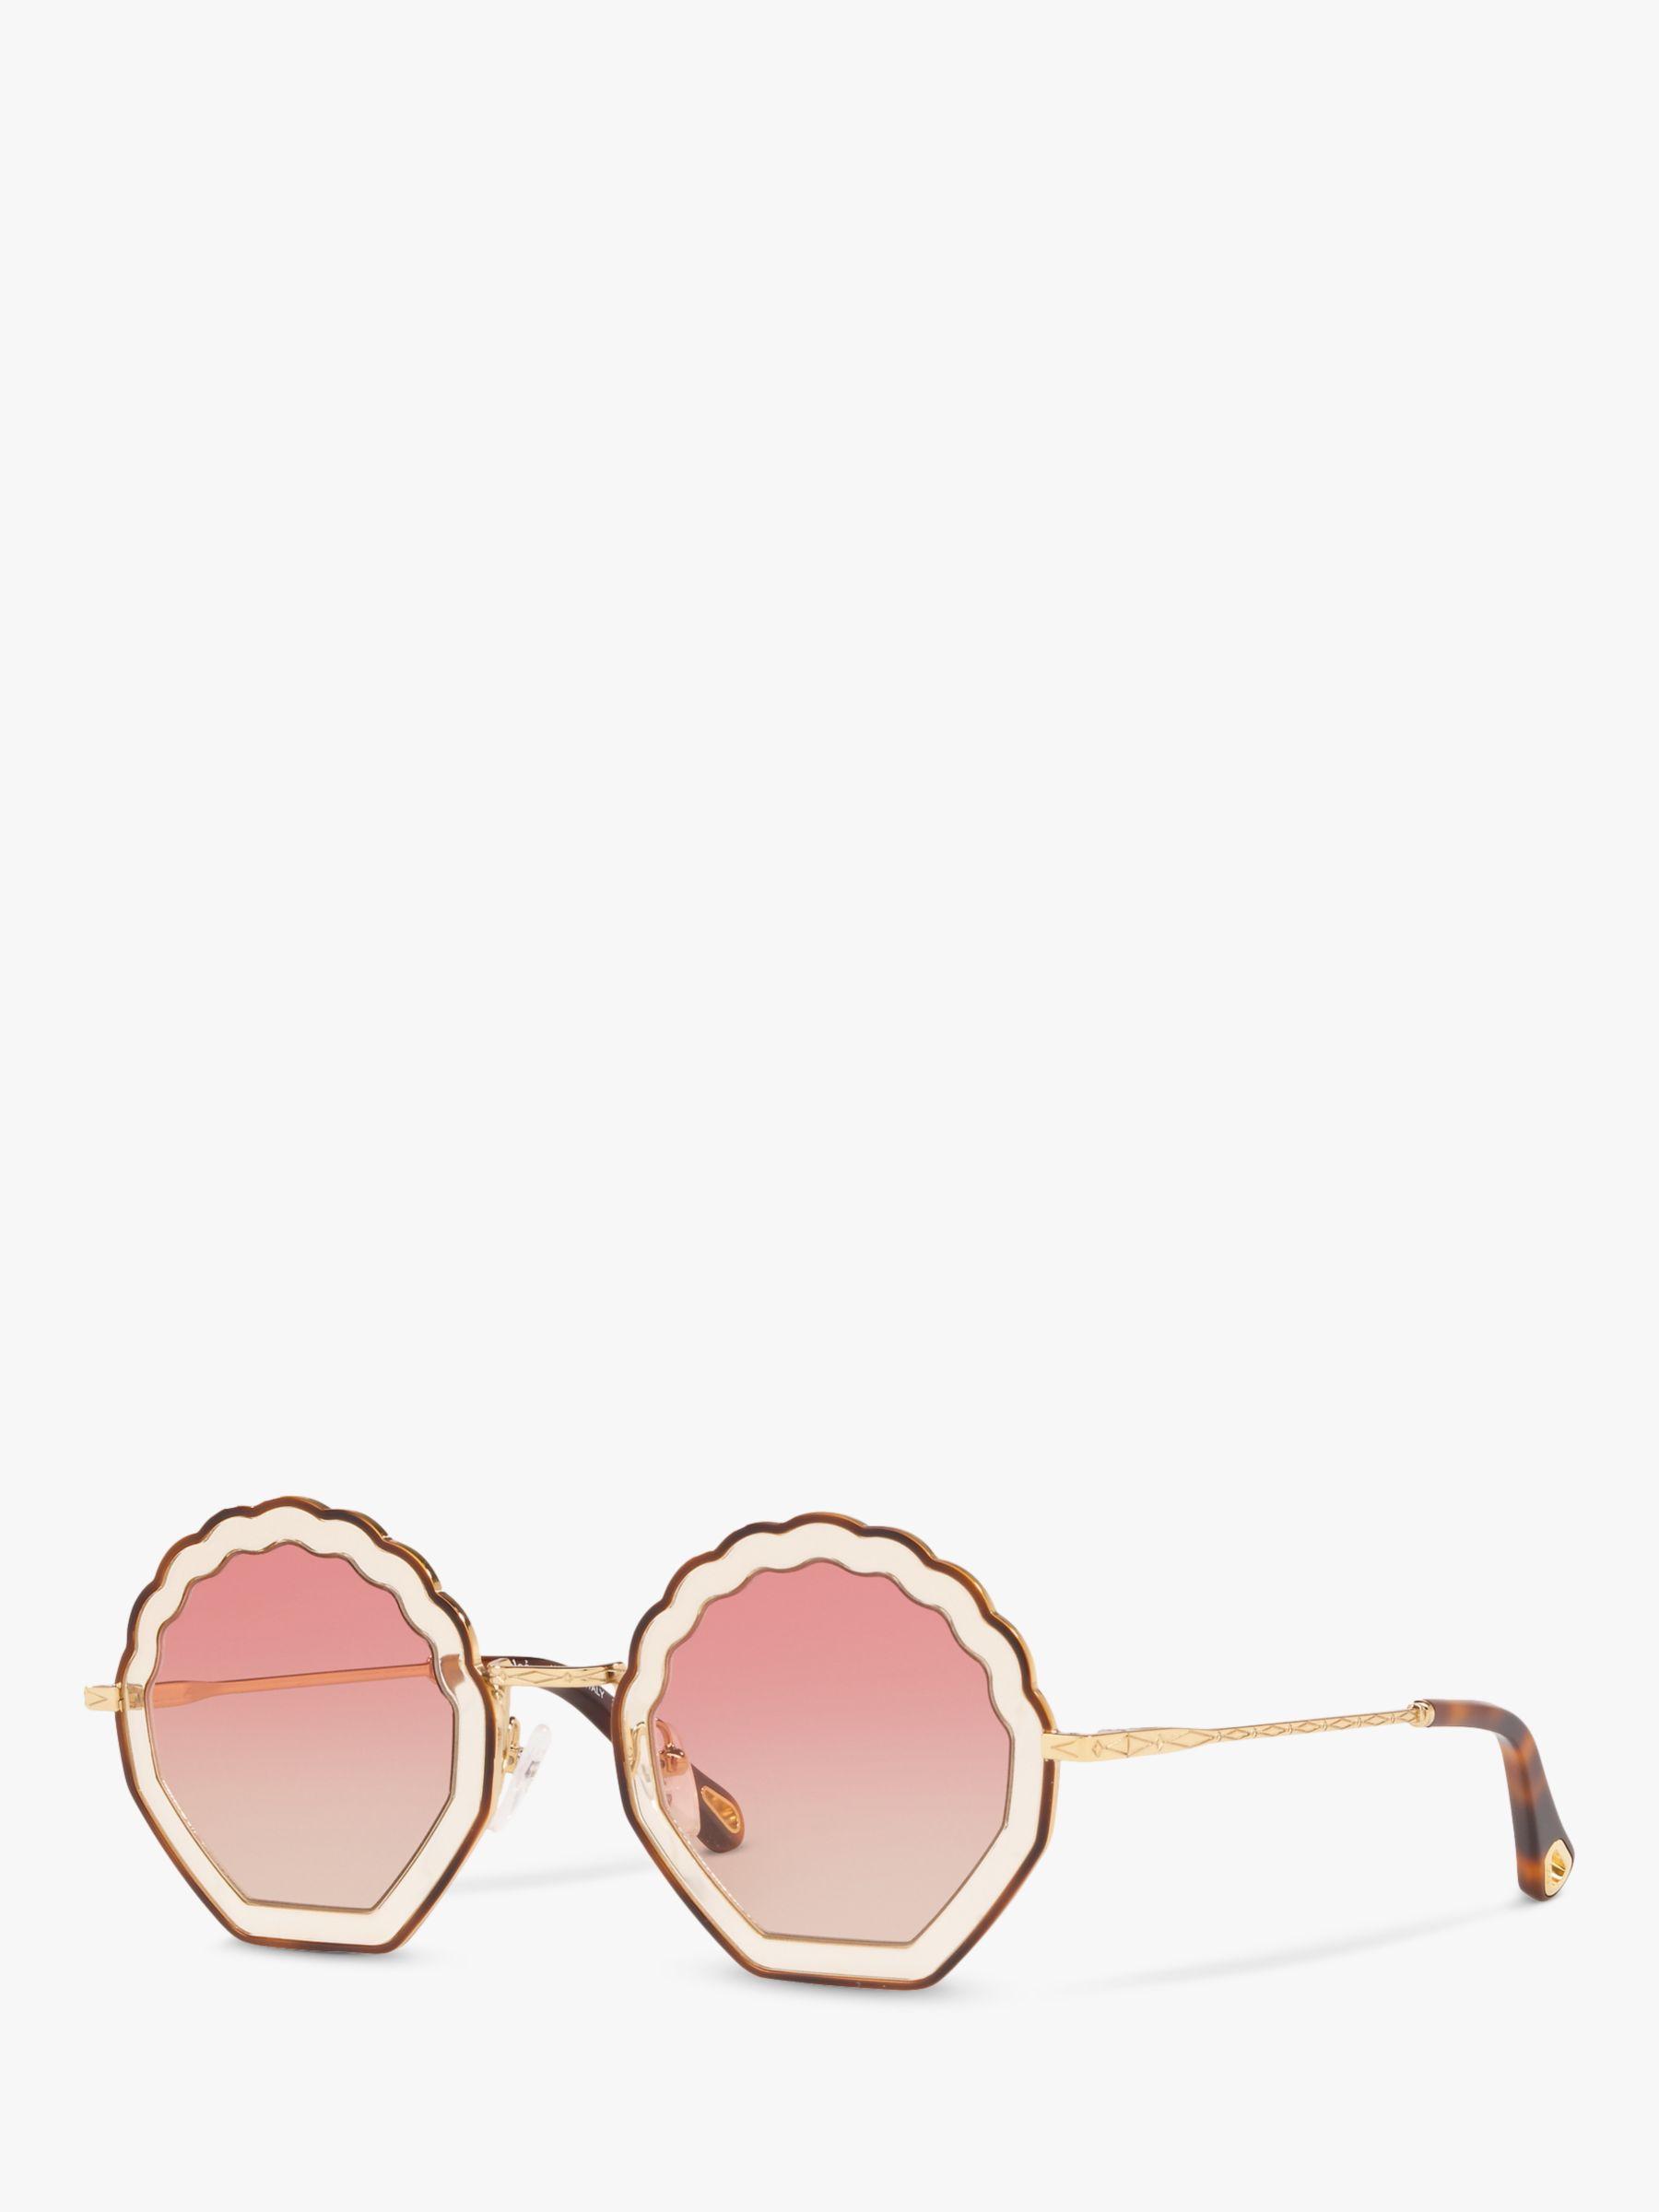 Chloe Chloé CE147S Women's Rectangular Scallop Sunglasses, Brown Tortoiseshell/Gold